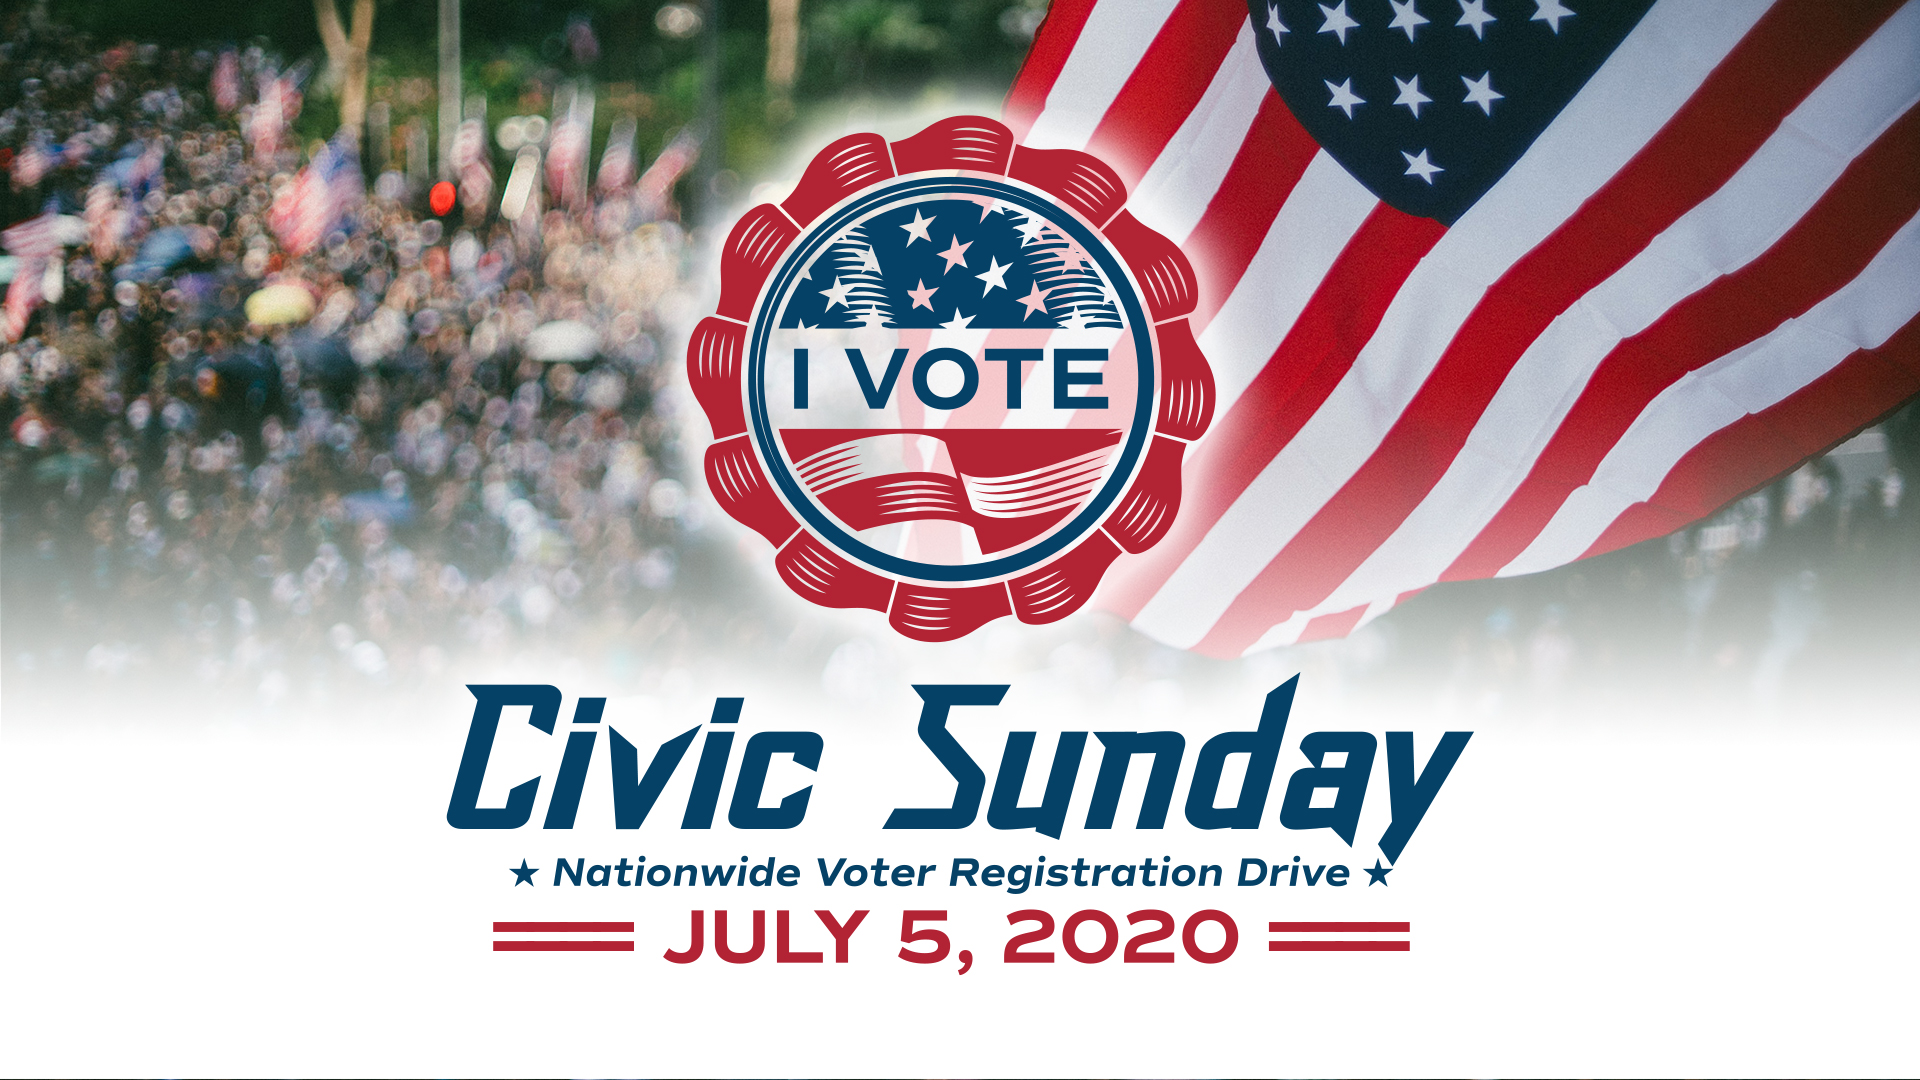 Civic Sunday Slide